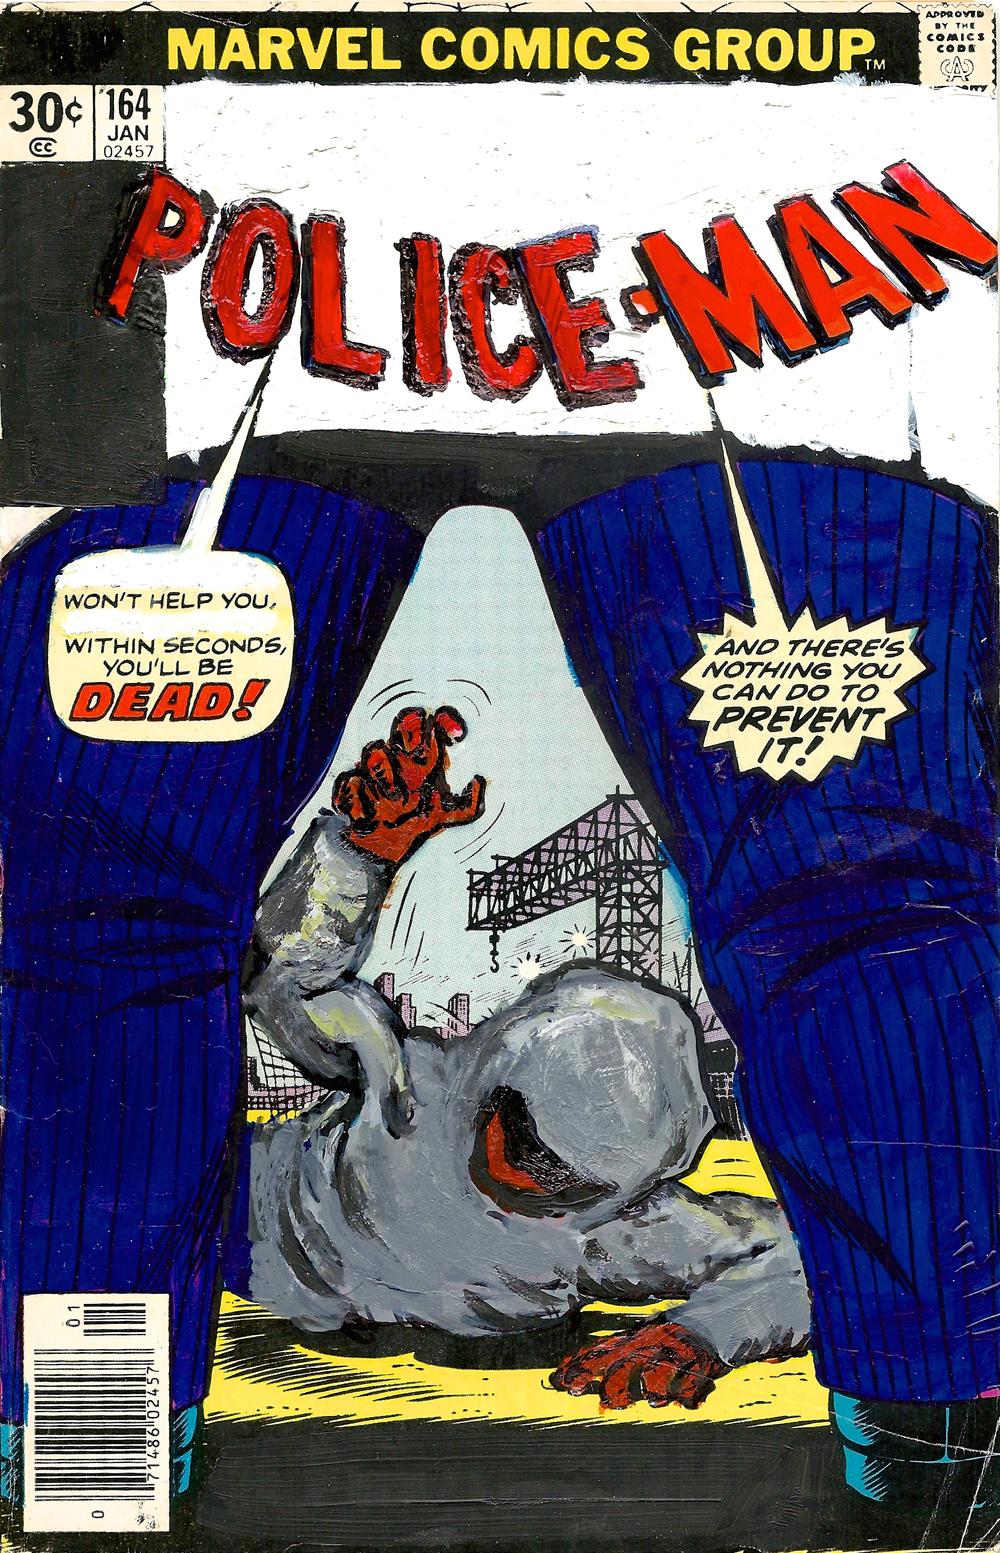 Police-Man #164